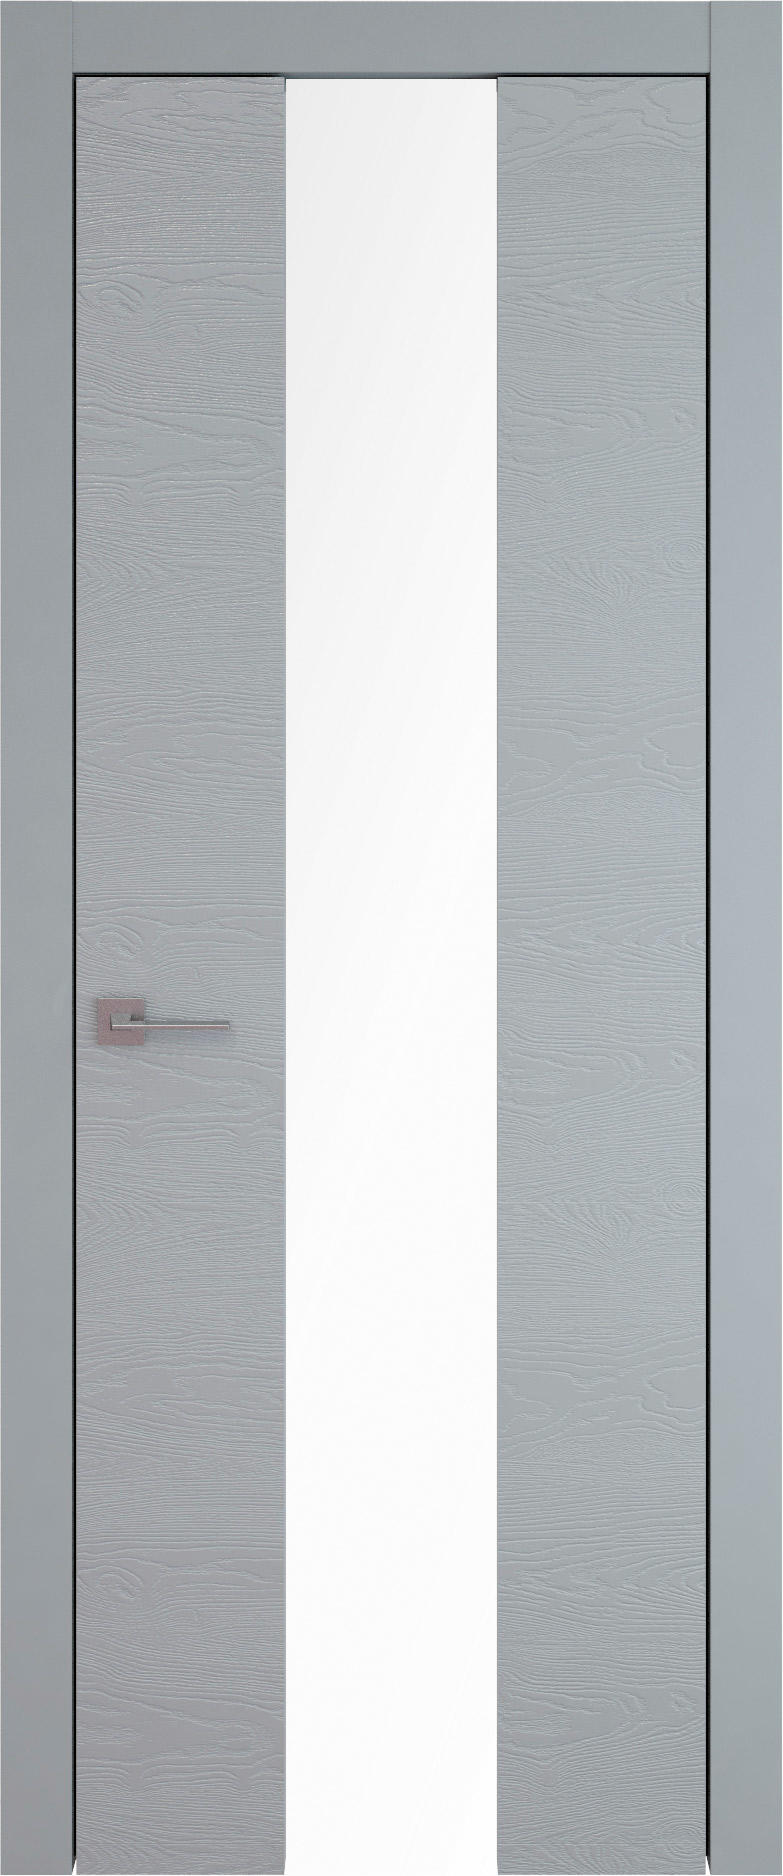 Tivoli Ж-5 цвет - Серебристо-серая эмаль по шпону (RAL 7045) Со стеклом (ДО)